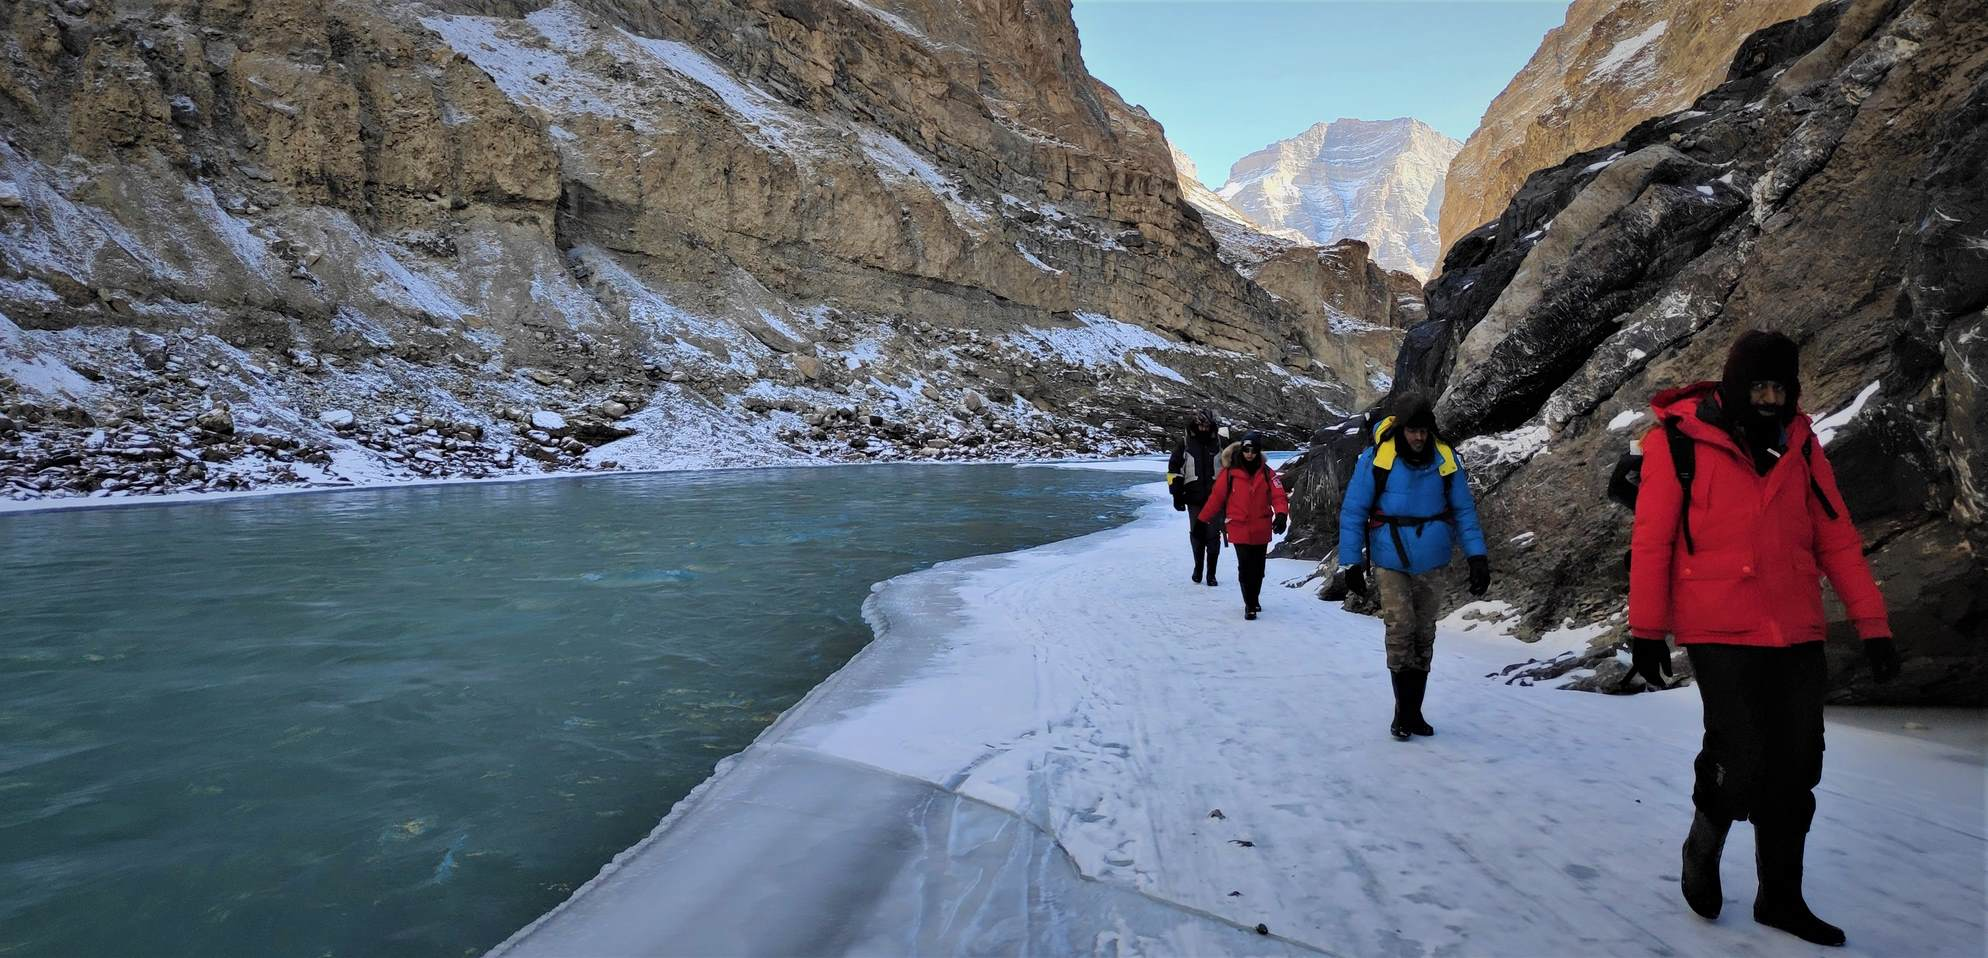 People trekking on Chadar trek on Frozan Zanskar River